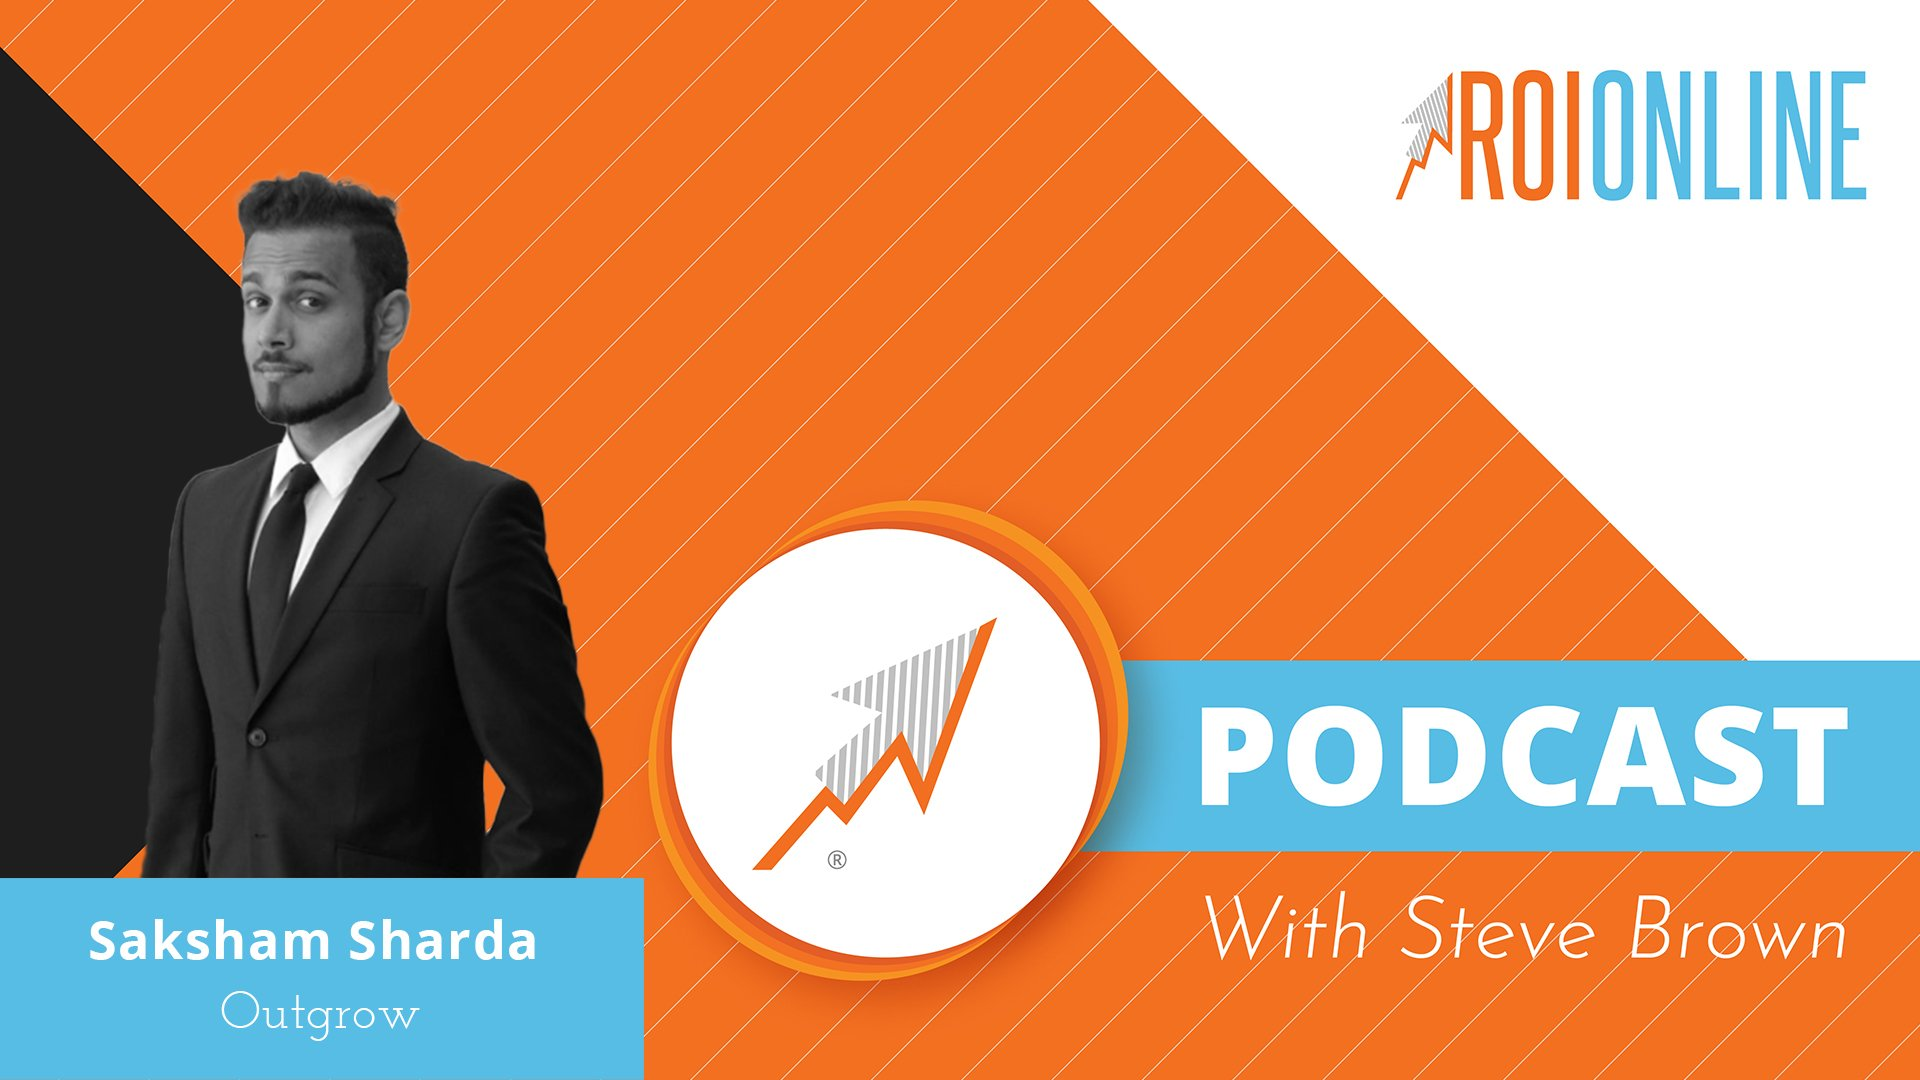 ROI Online Podcast thumbnail graphic Saksham Sharda